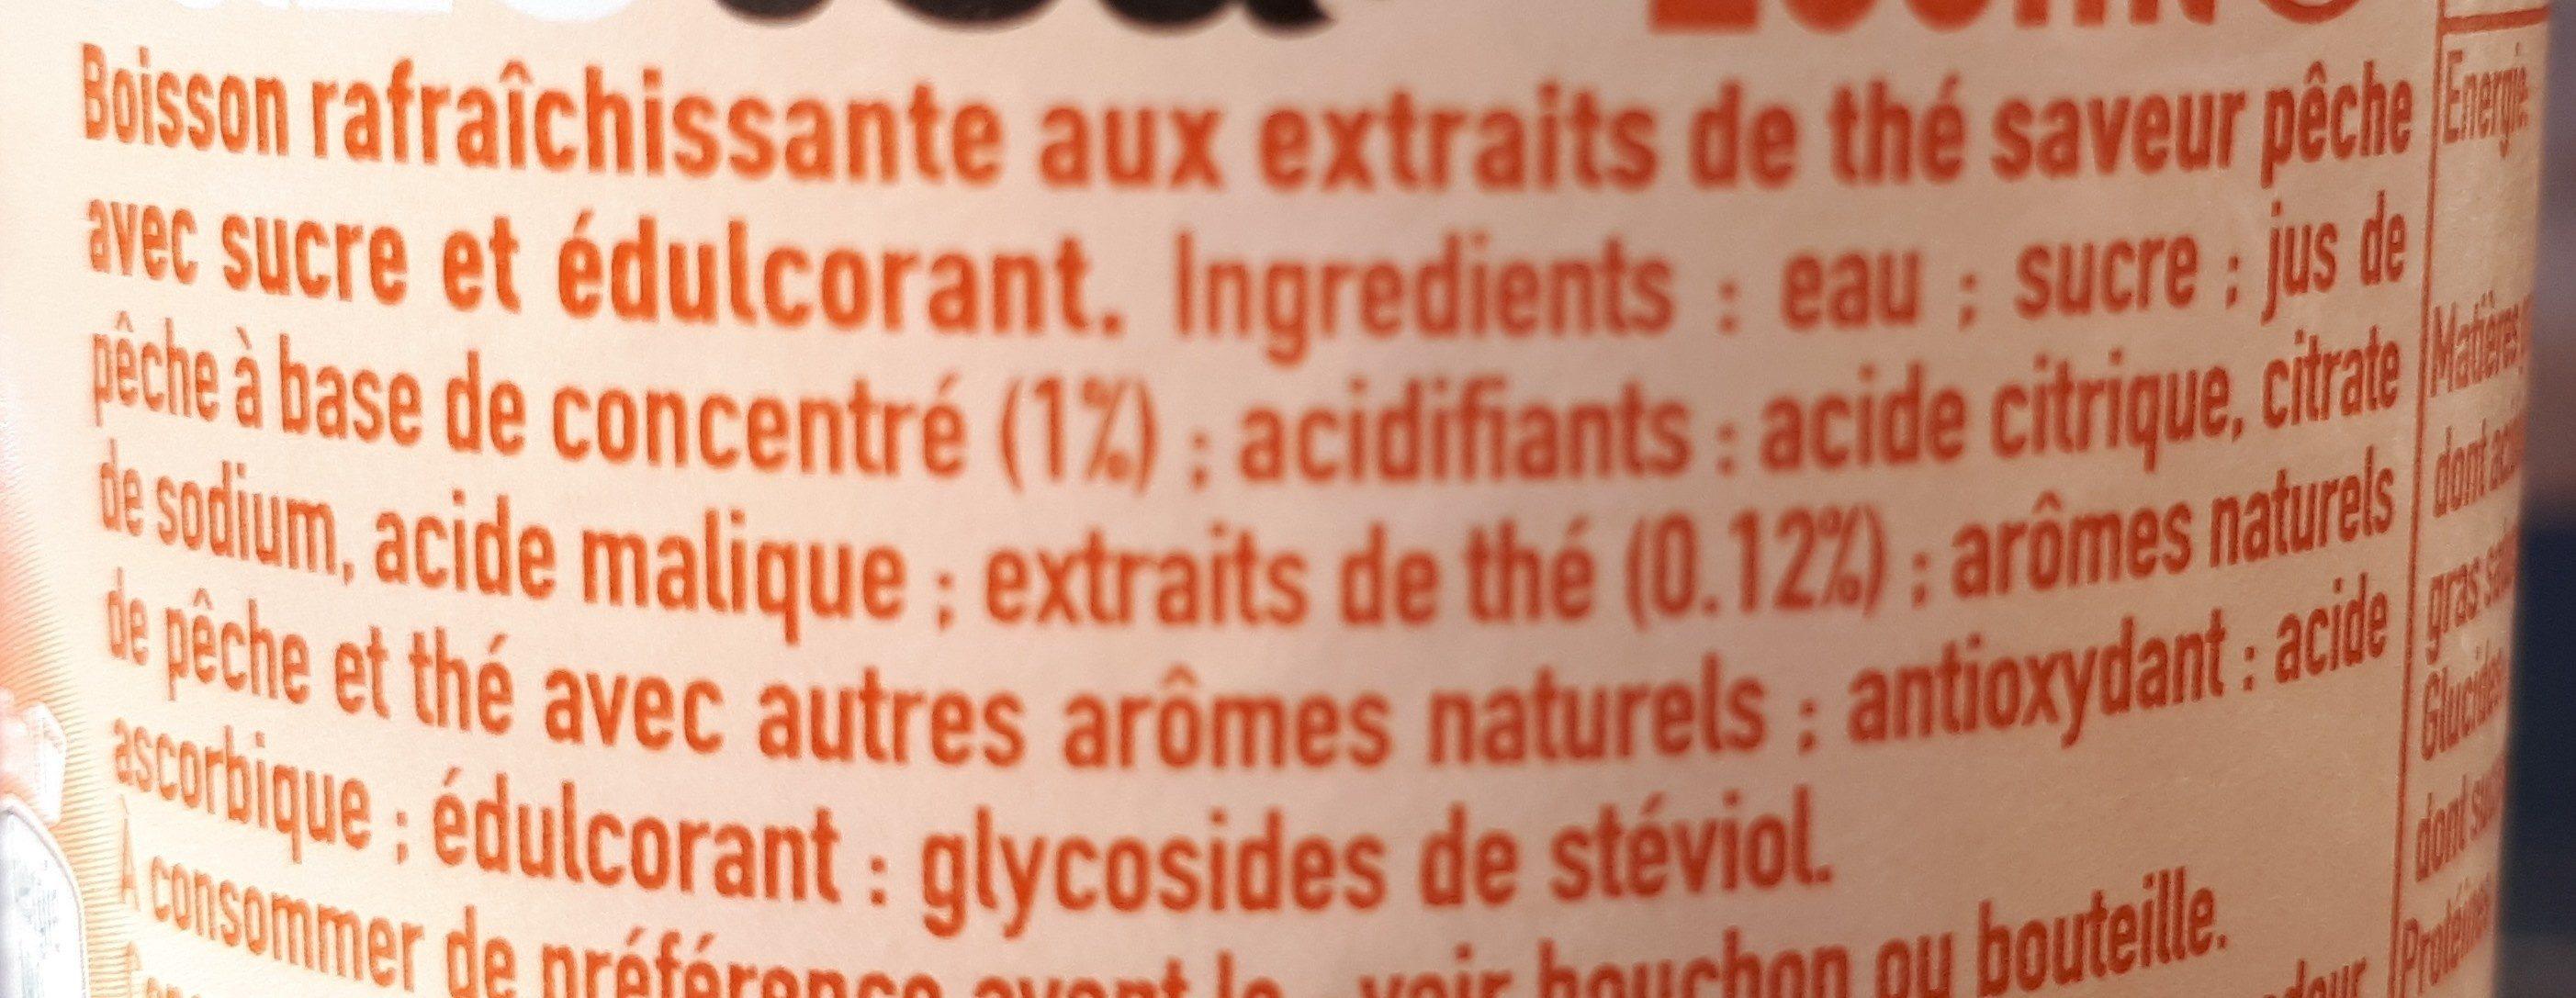 Thé glacé pêche intense - Ingredients